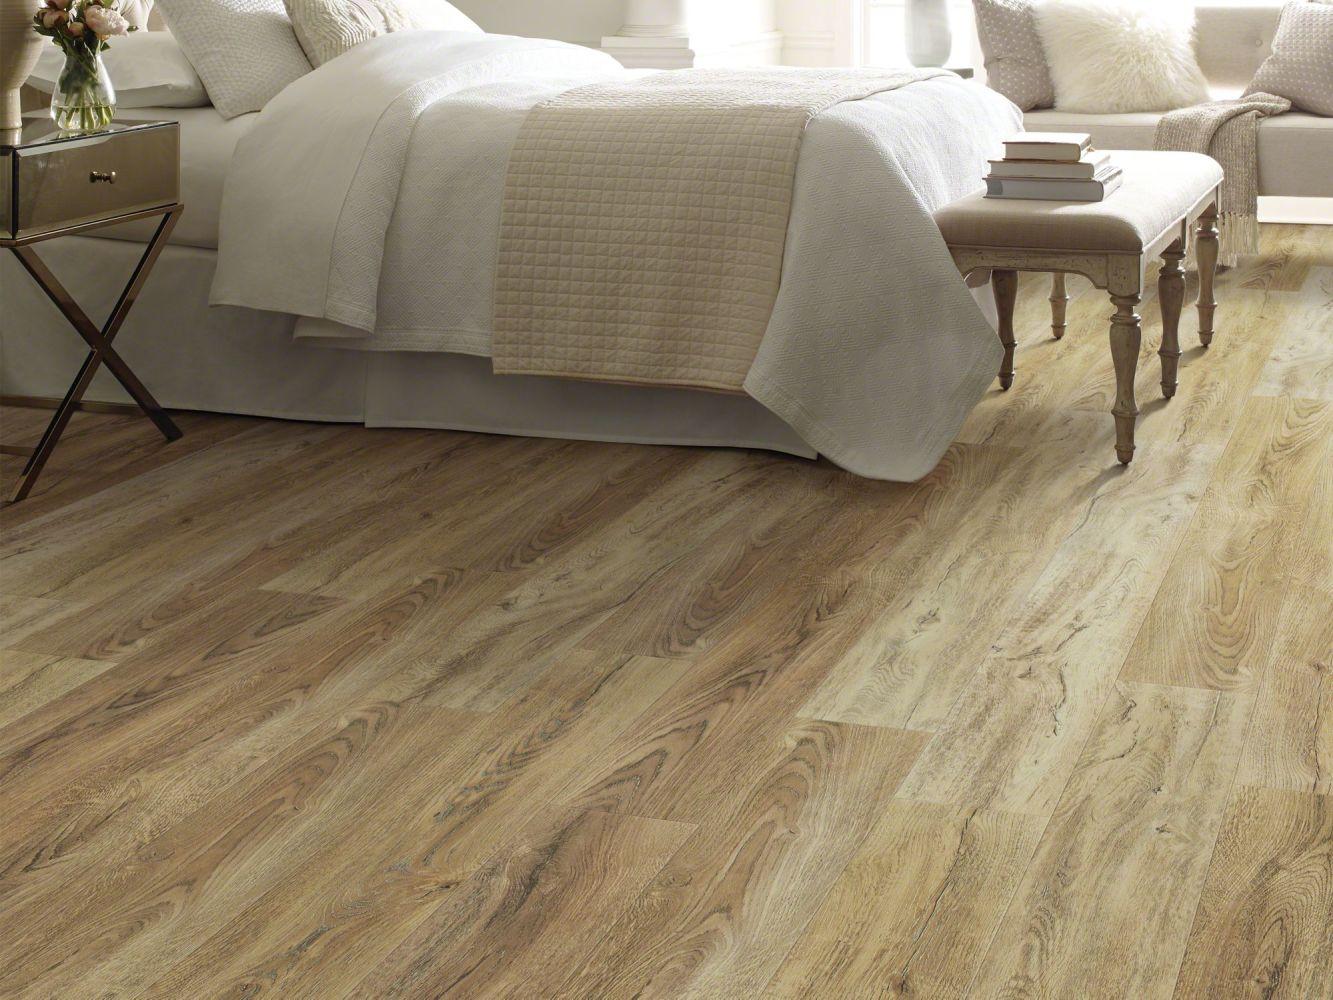 Shaw Floors Vinyl Residential Mountainside HD Absaroka 00282_VH549